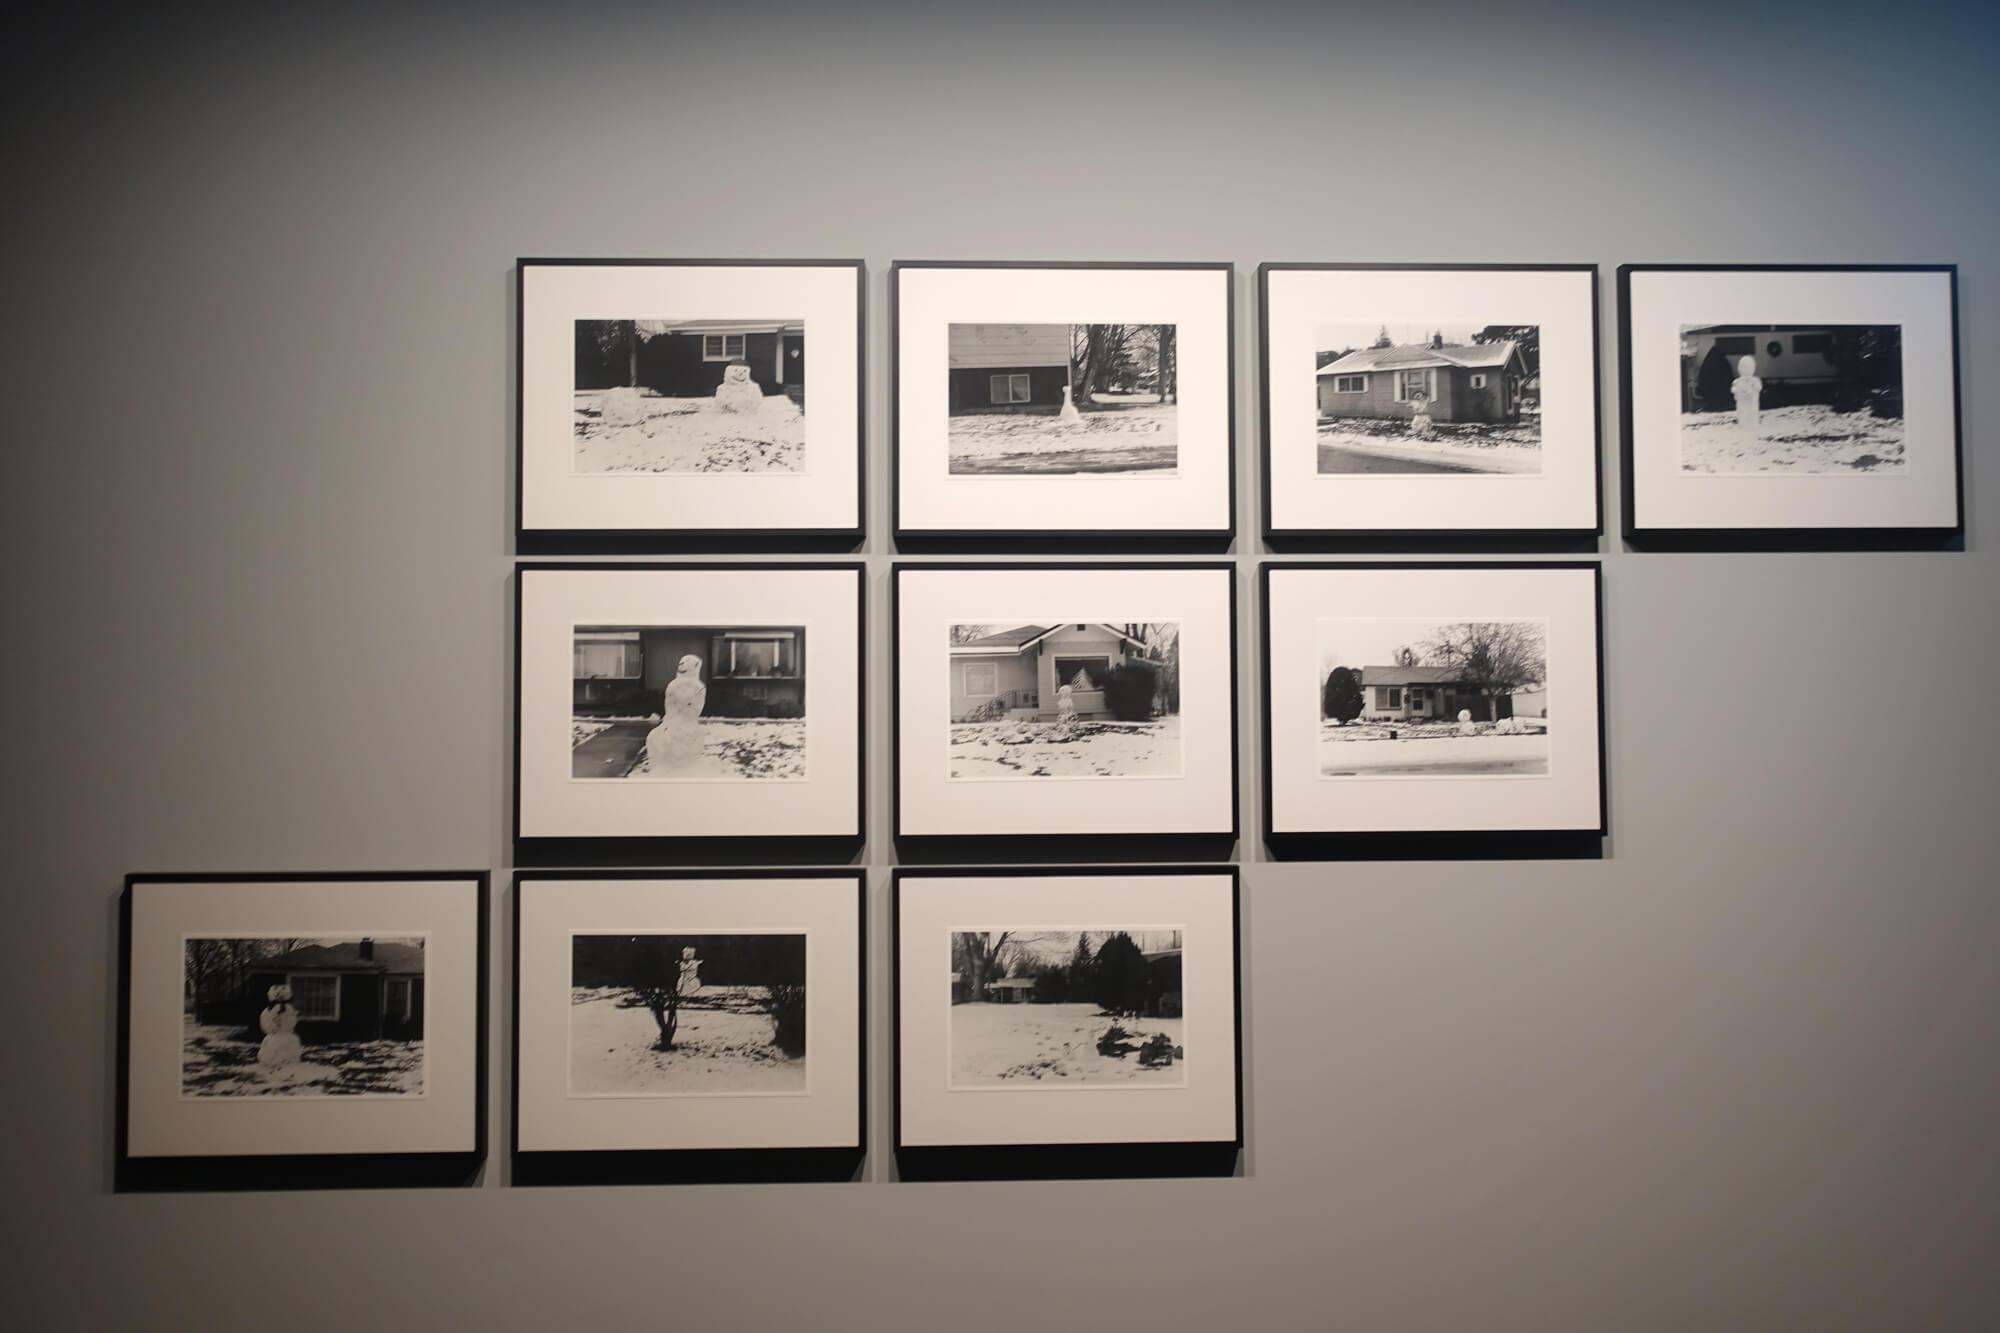 David Lynch - Infinite Deep Exhibit in Olten, Switzerland